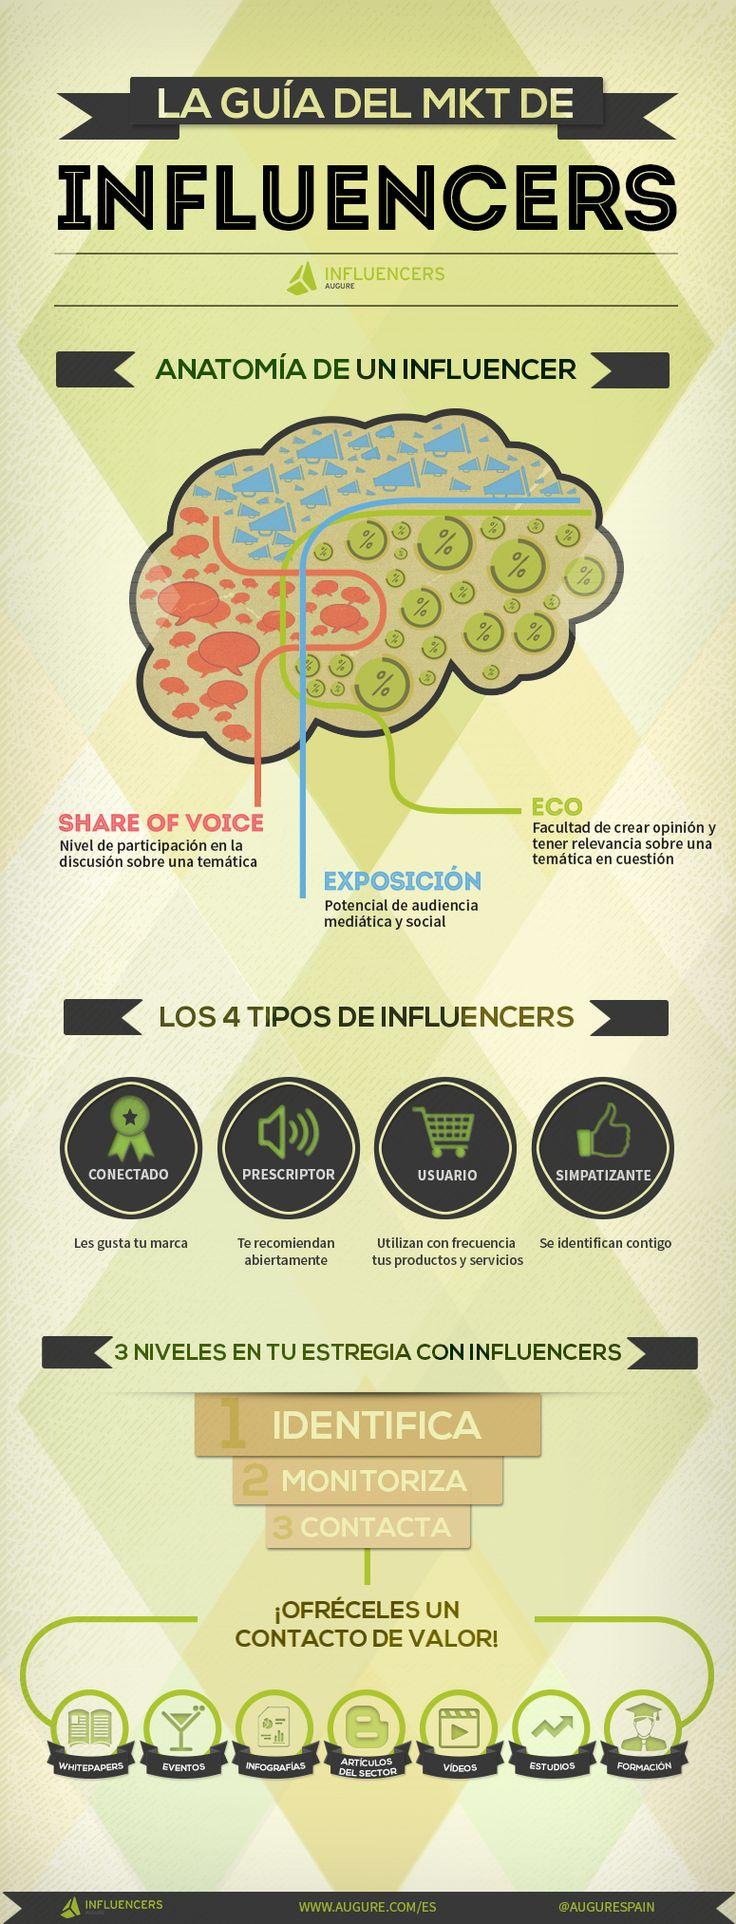 Guía del marketing de Influencers #infografia #infographic #marketing